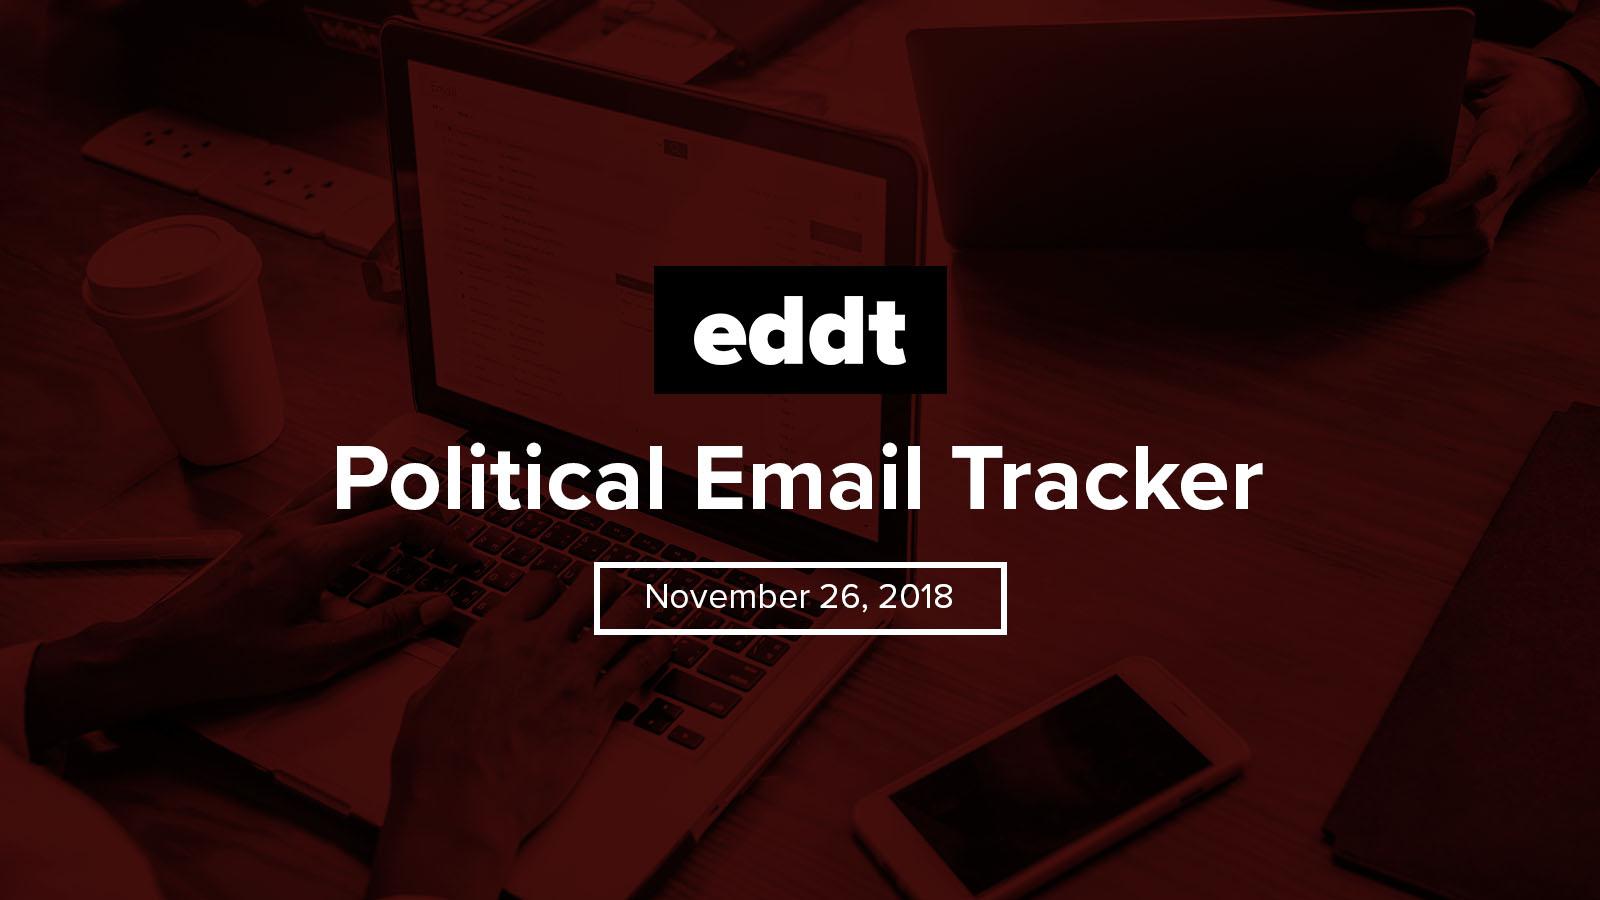 Political Email Tracker - November 26, 2018